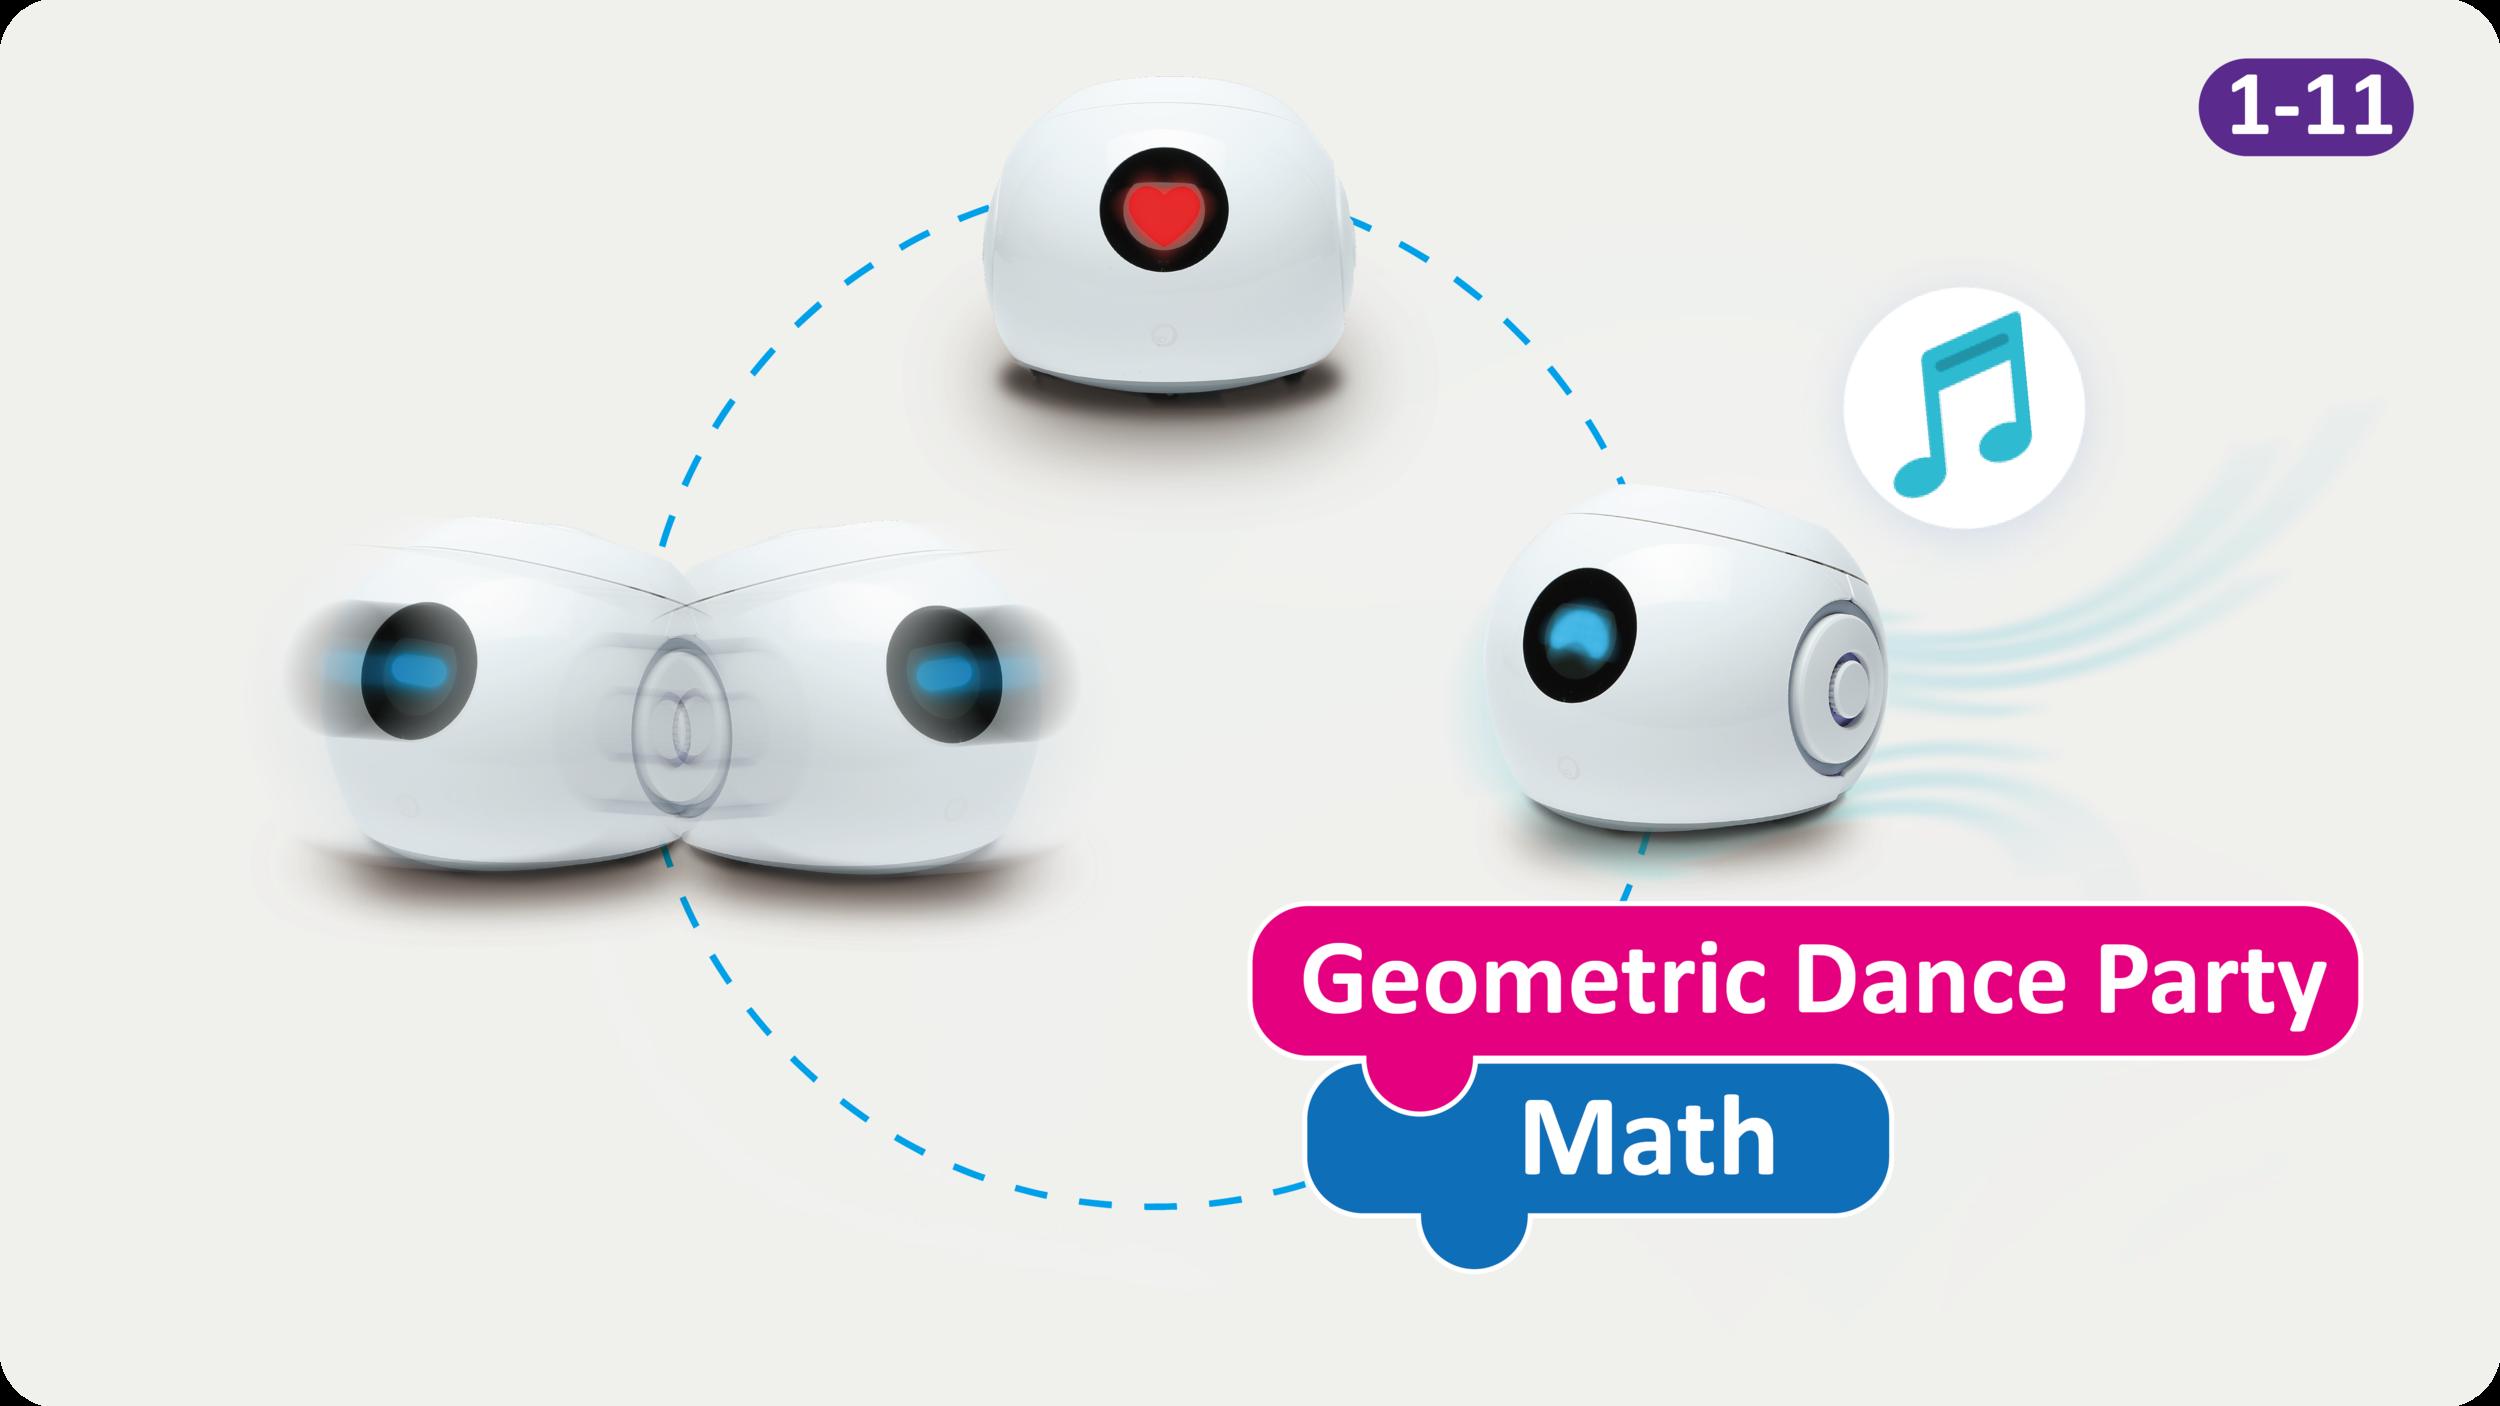 Geometric Dance Party